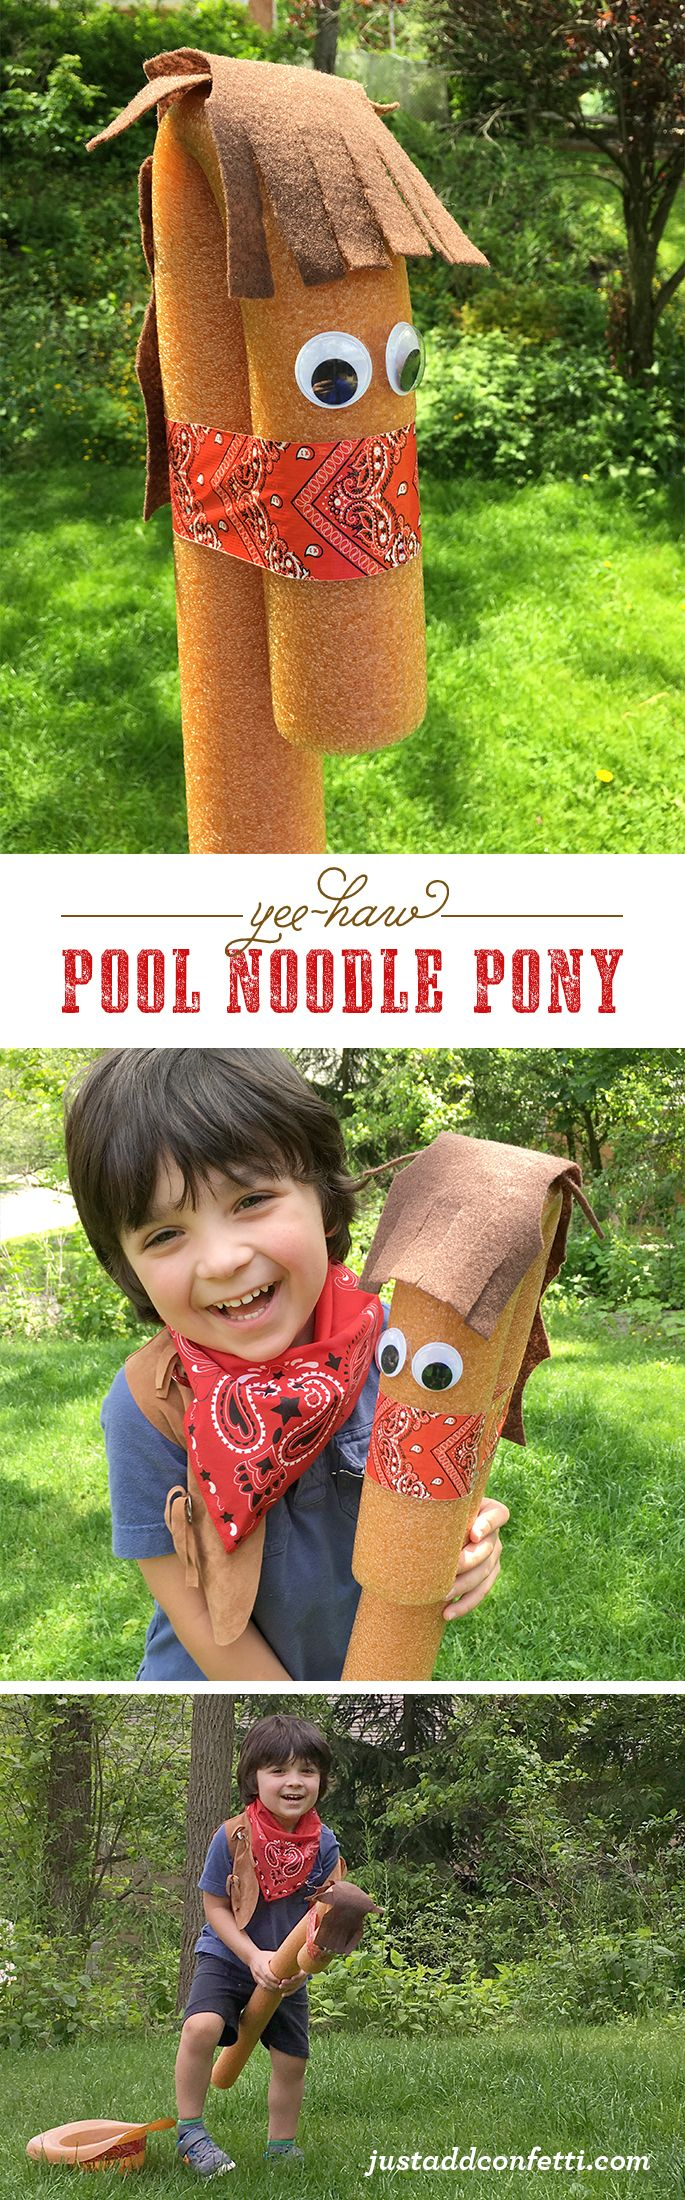 Pool Noodle Pony - Just Add Confetti